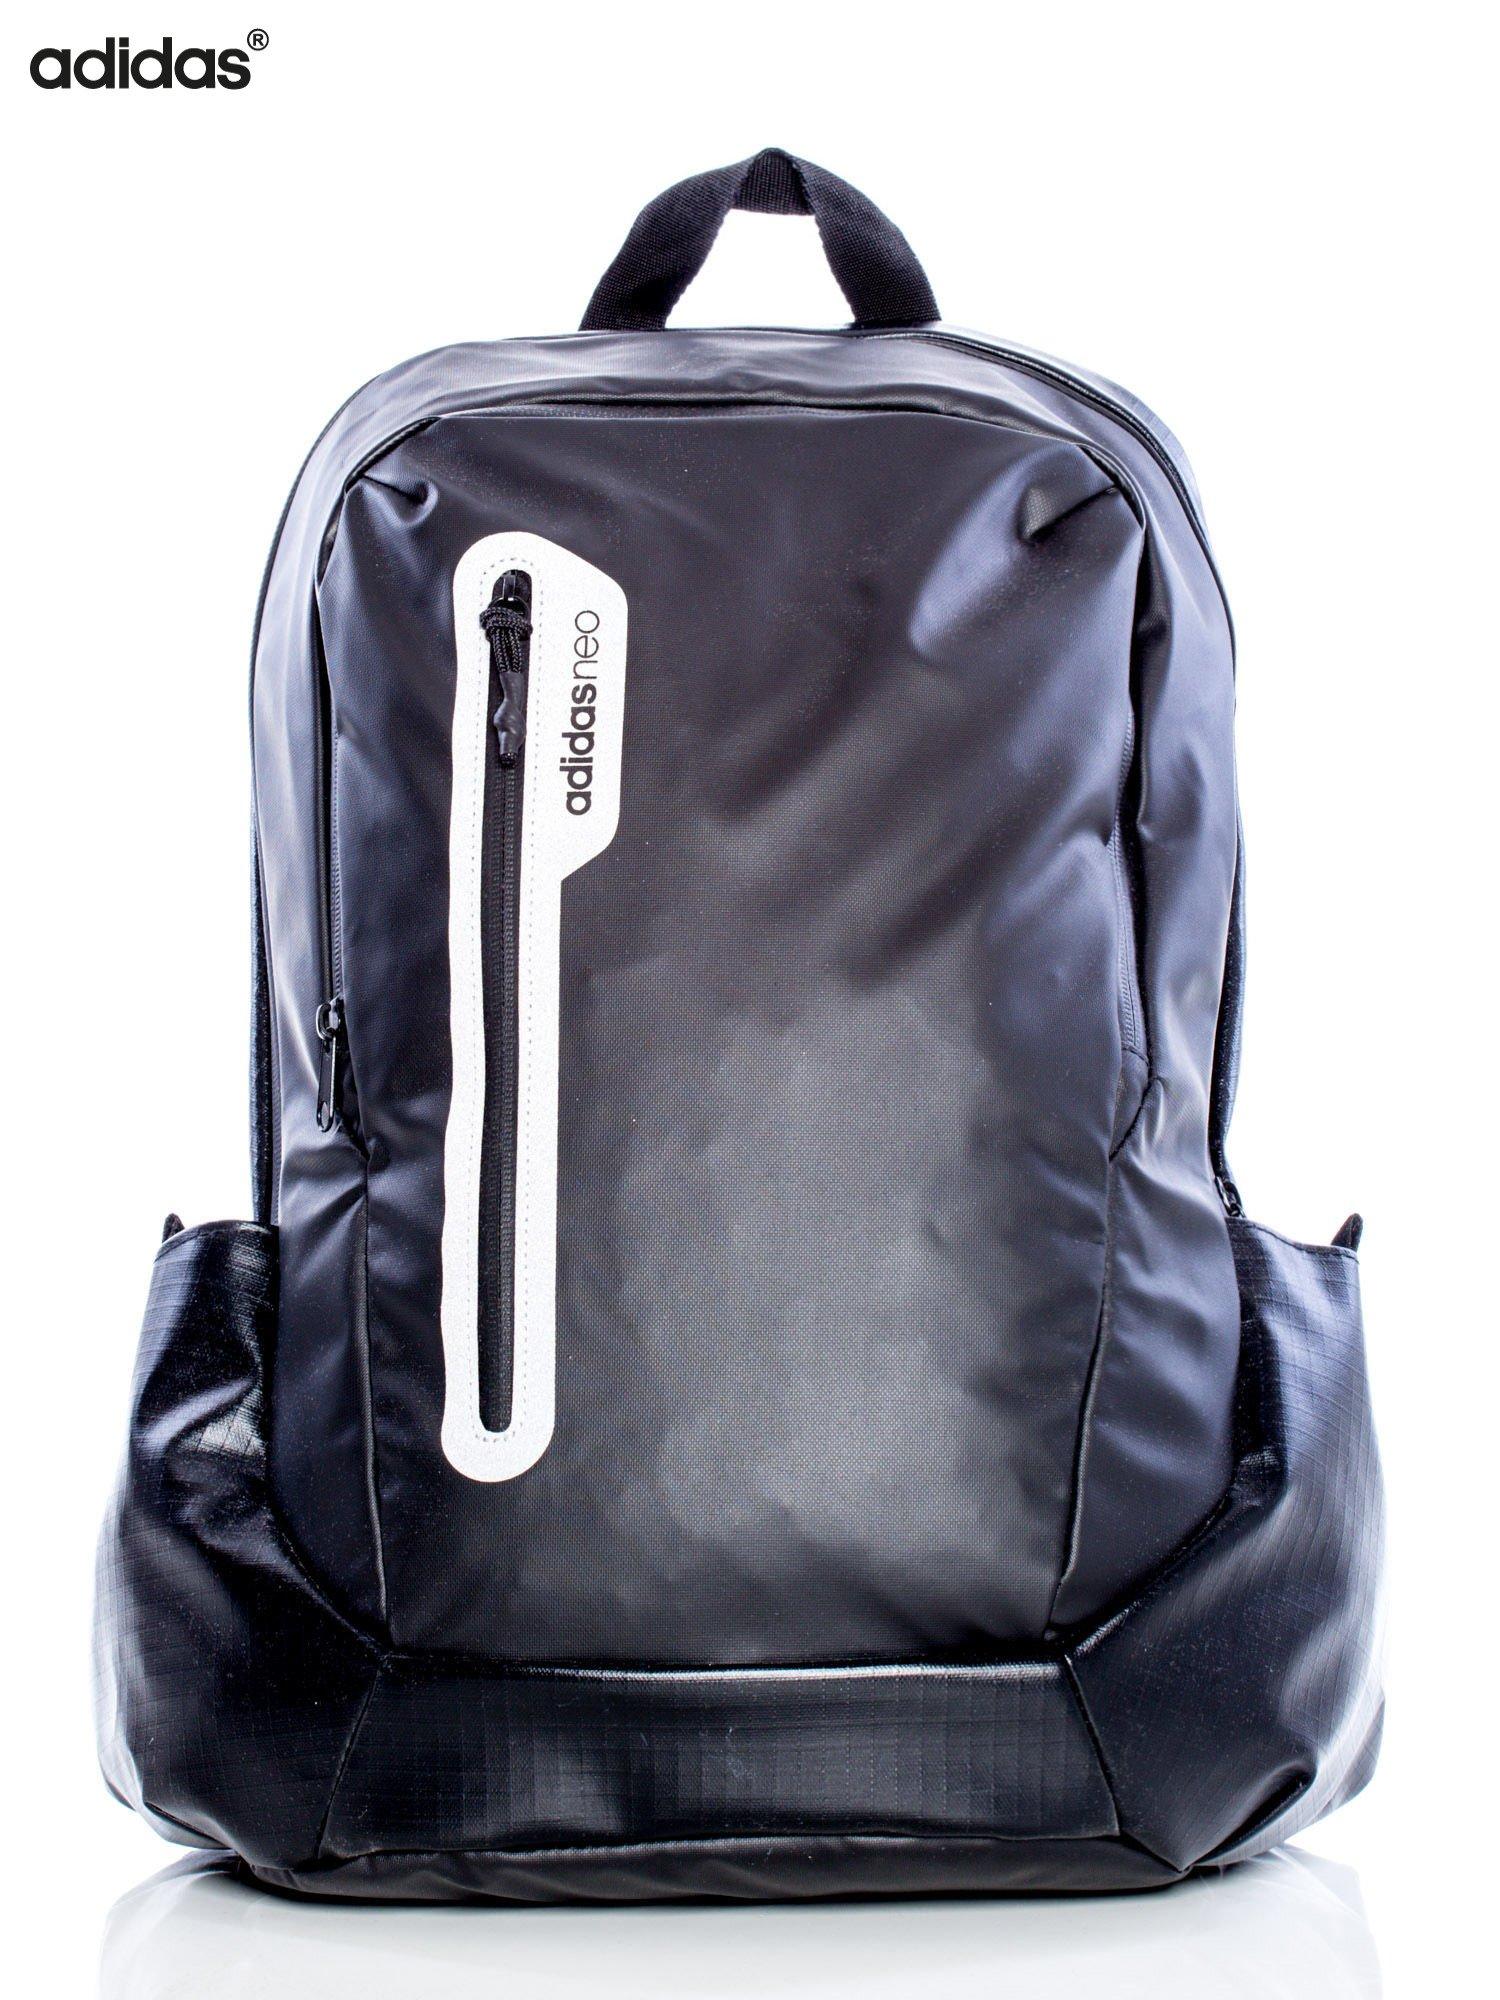 5ceb79e19b80c ADIDAS Czarny wodoodporny plecak BQ1300 BP N NEOPARK + - Dziecko ...